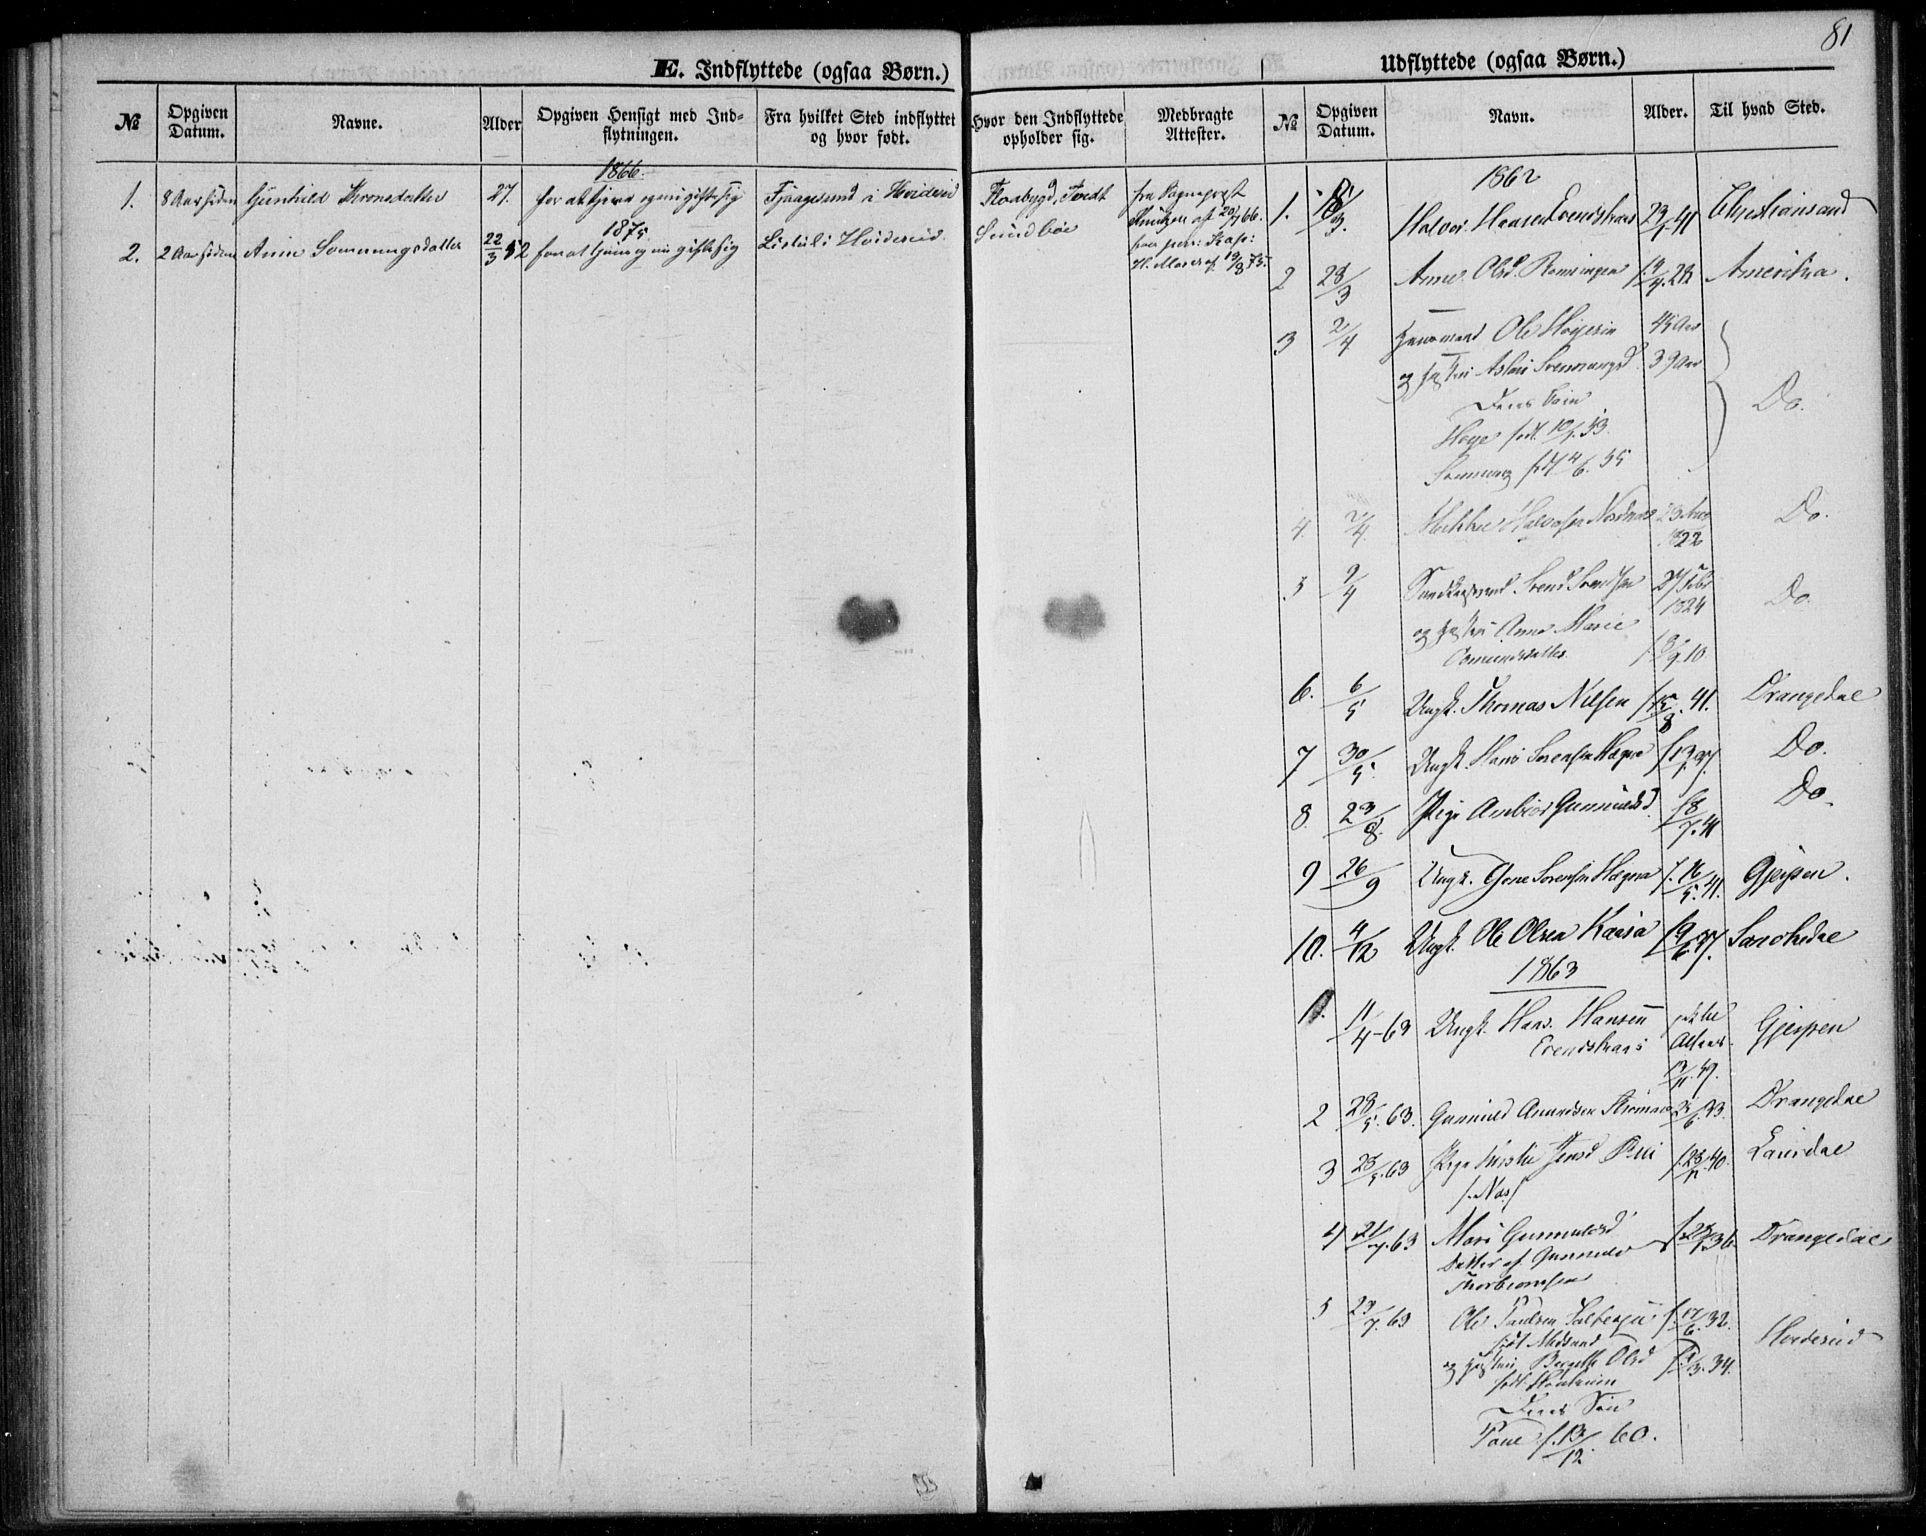 SAKO, Lunde kirkebøker, F/Fb/L0002: Ministerialbok nr. II 2, 1861-1881, s. 81